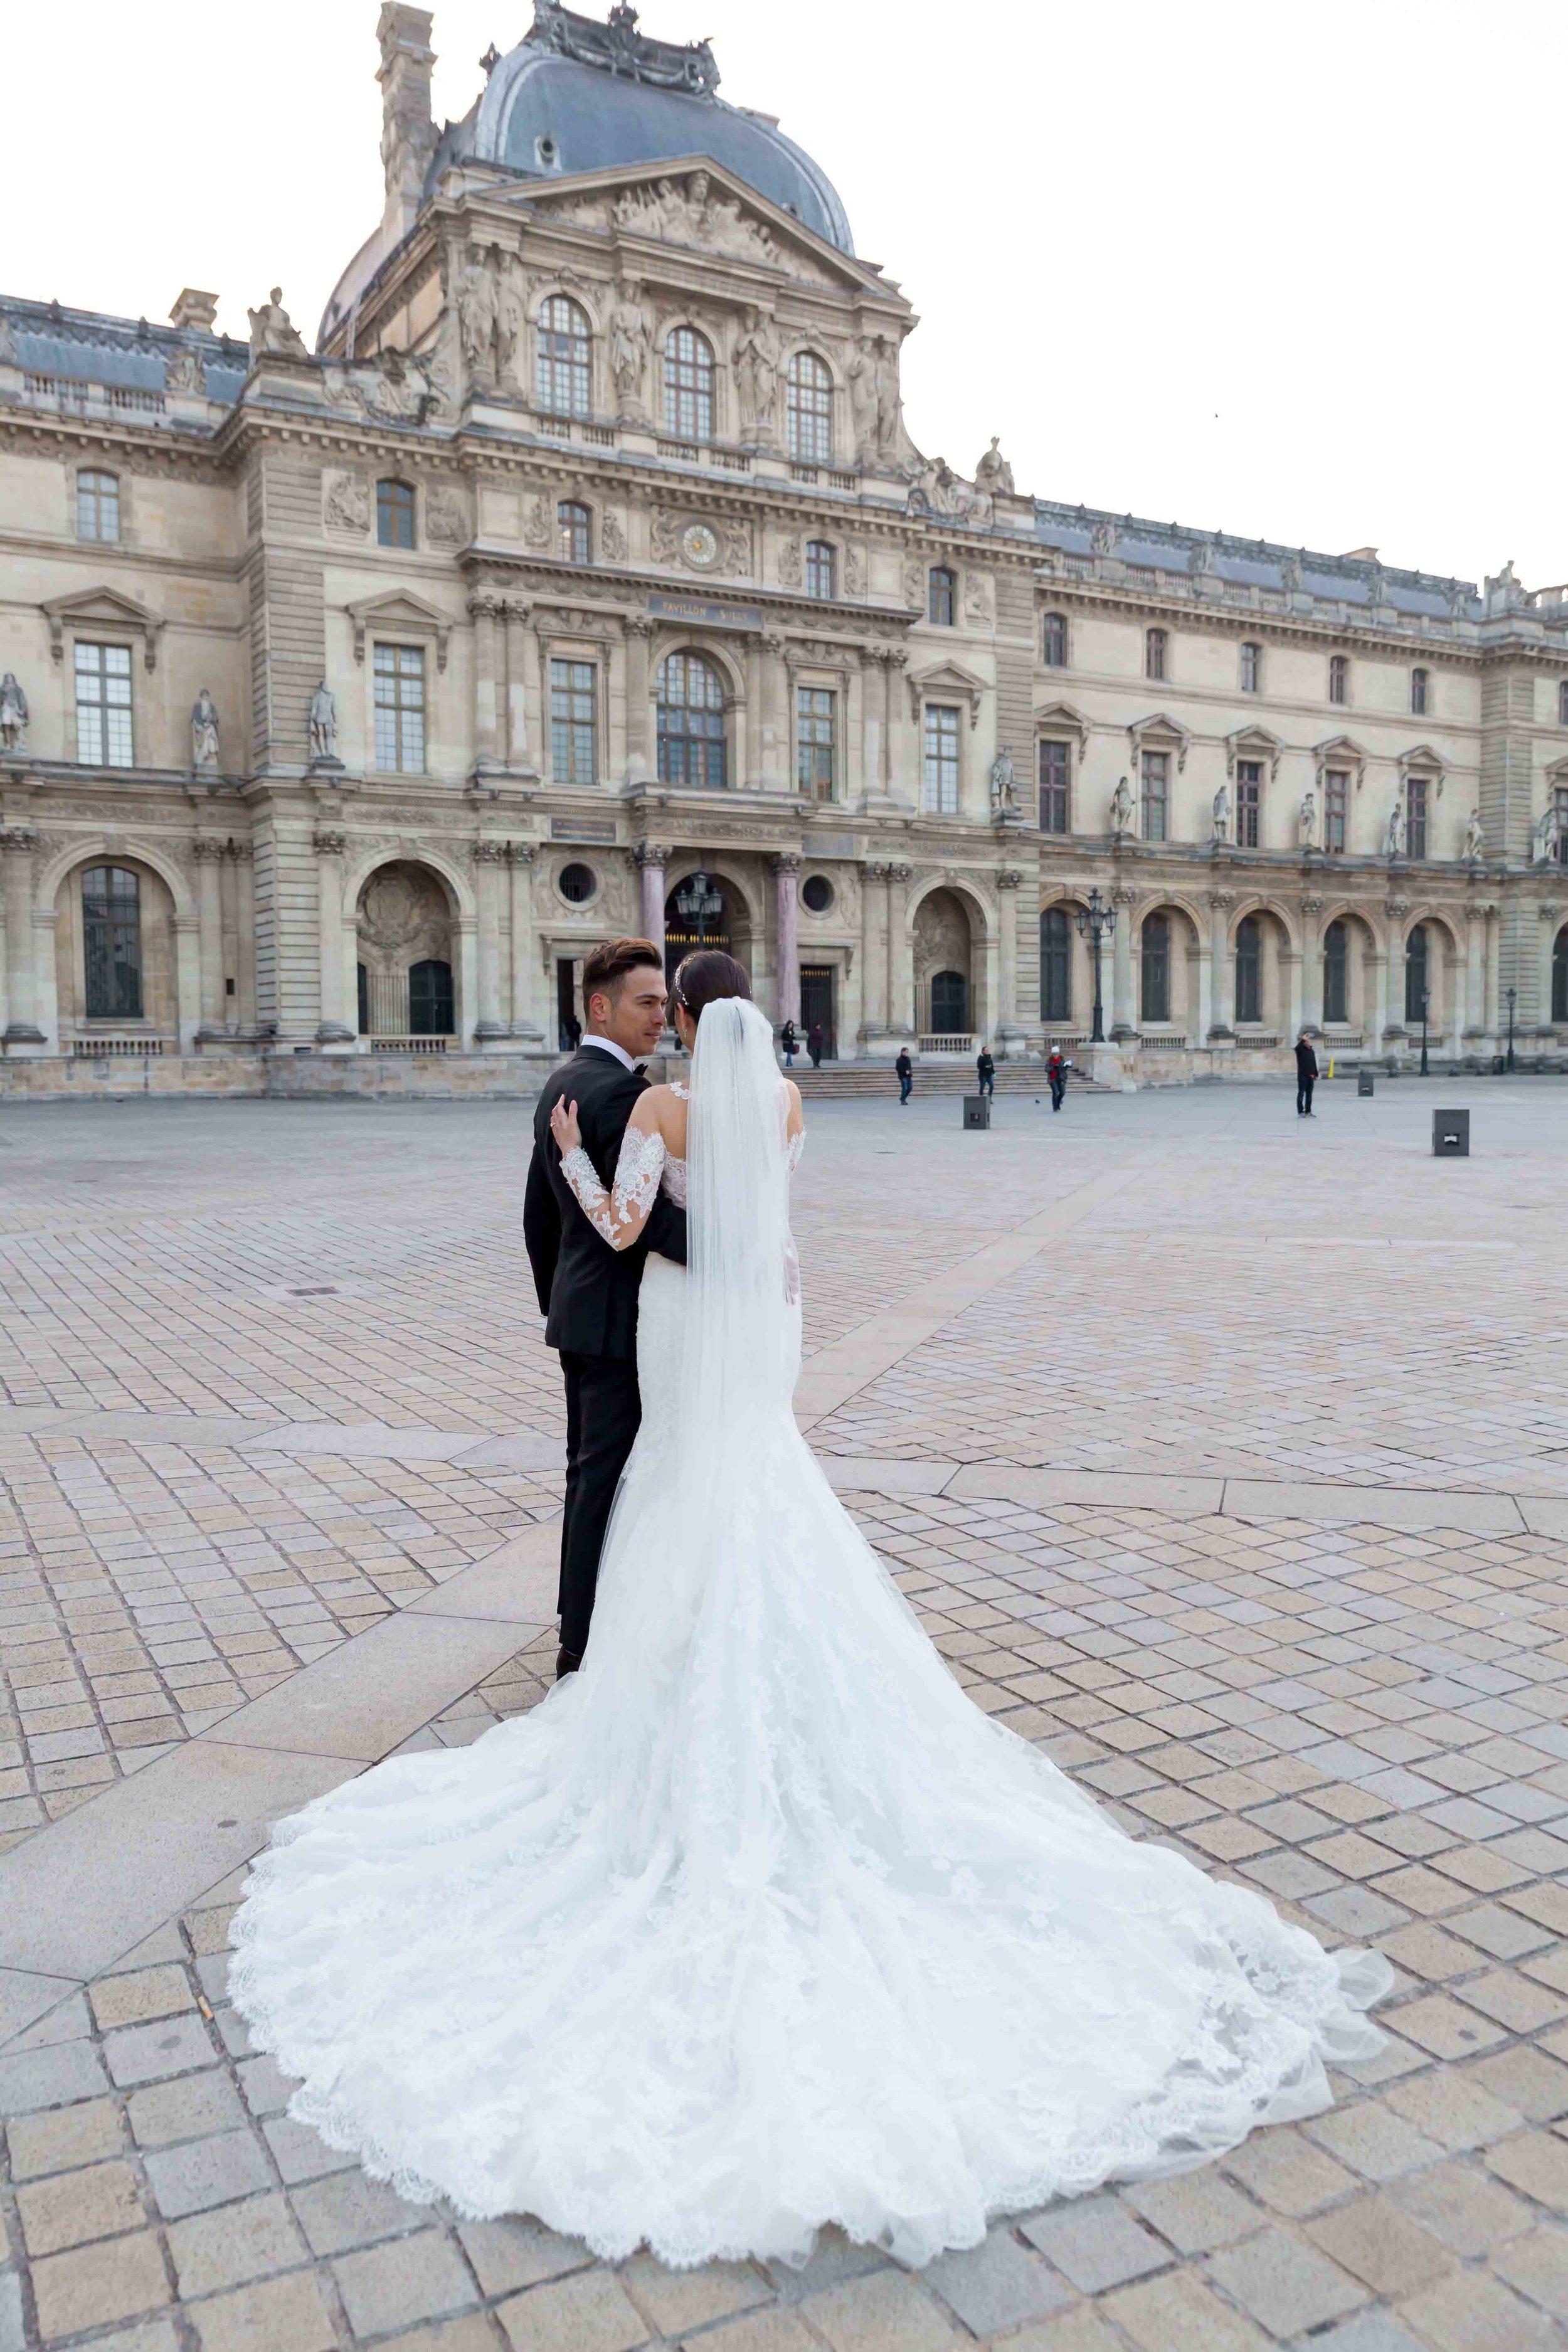 Balades_Photographiques_Paris_Merve_Kemel-38bis.jpg